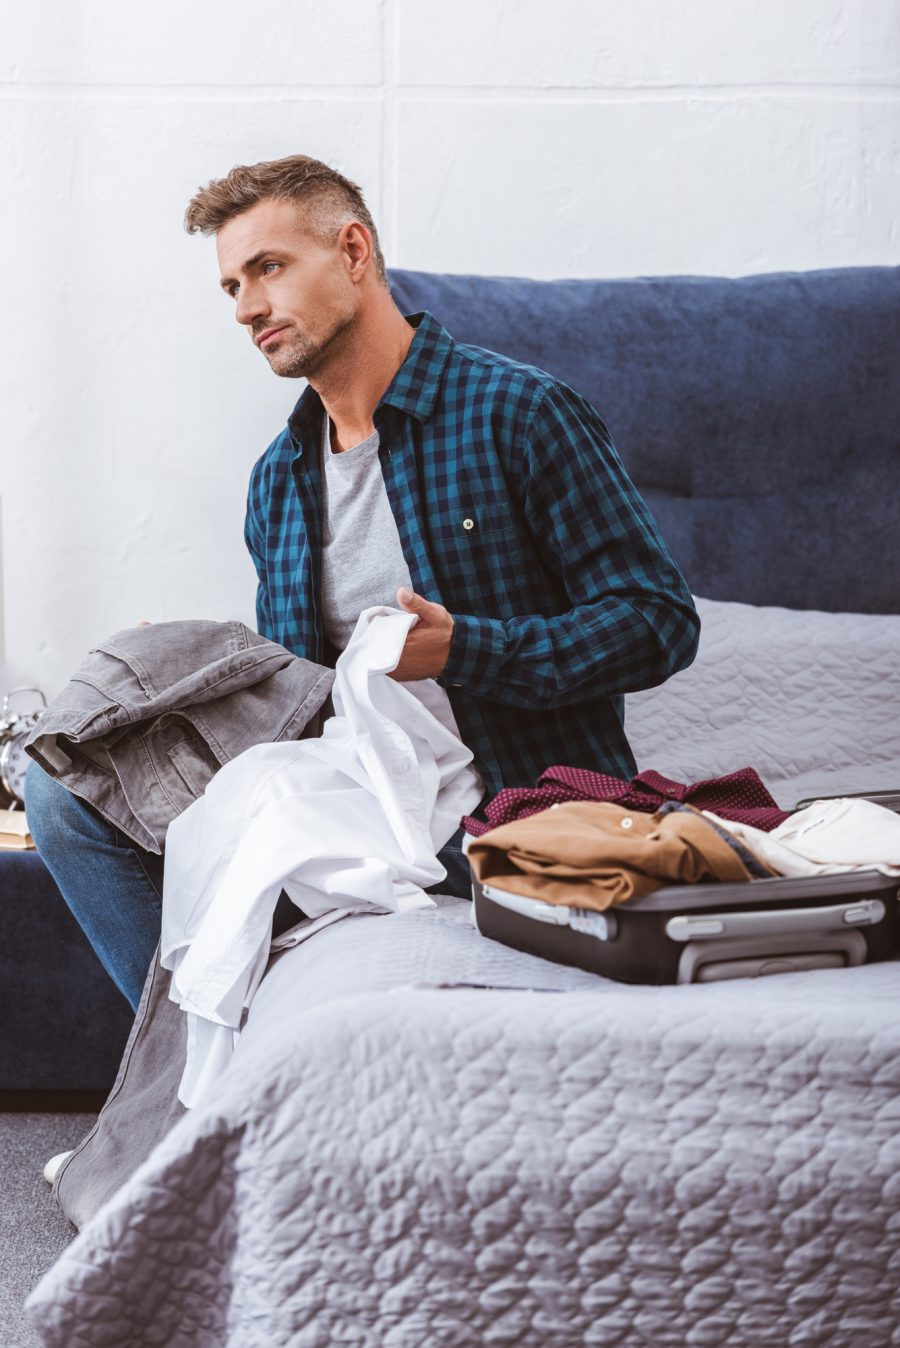 Man Organizing Clothes